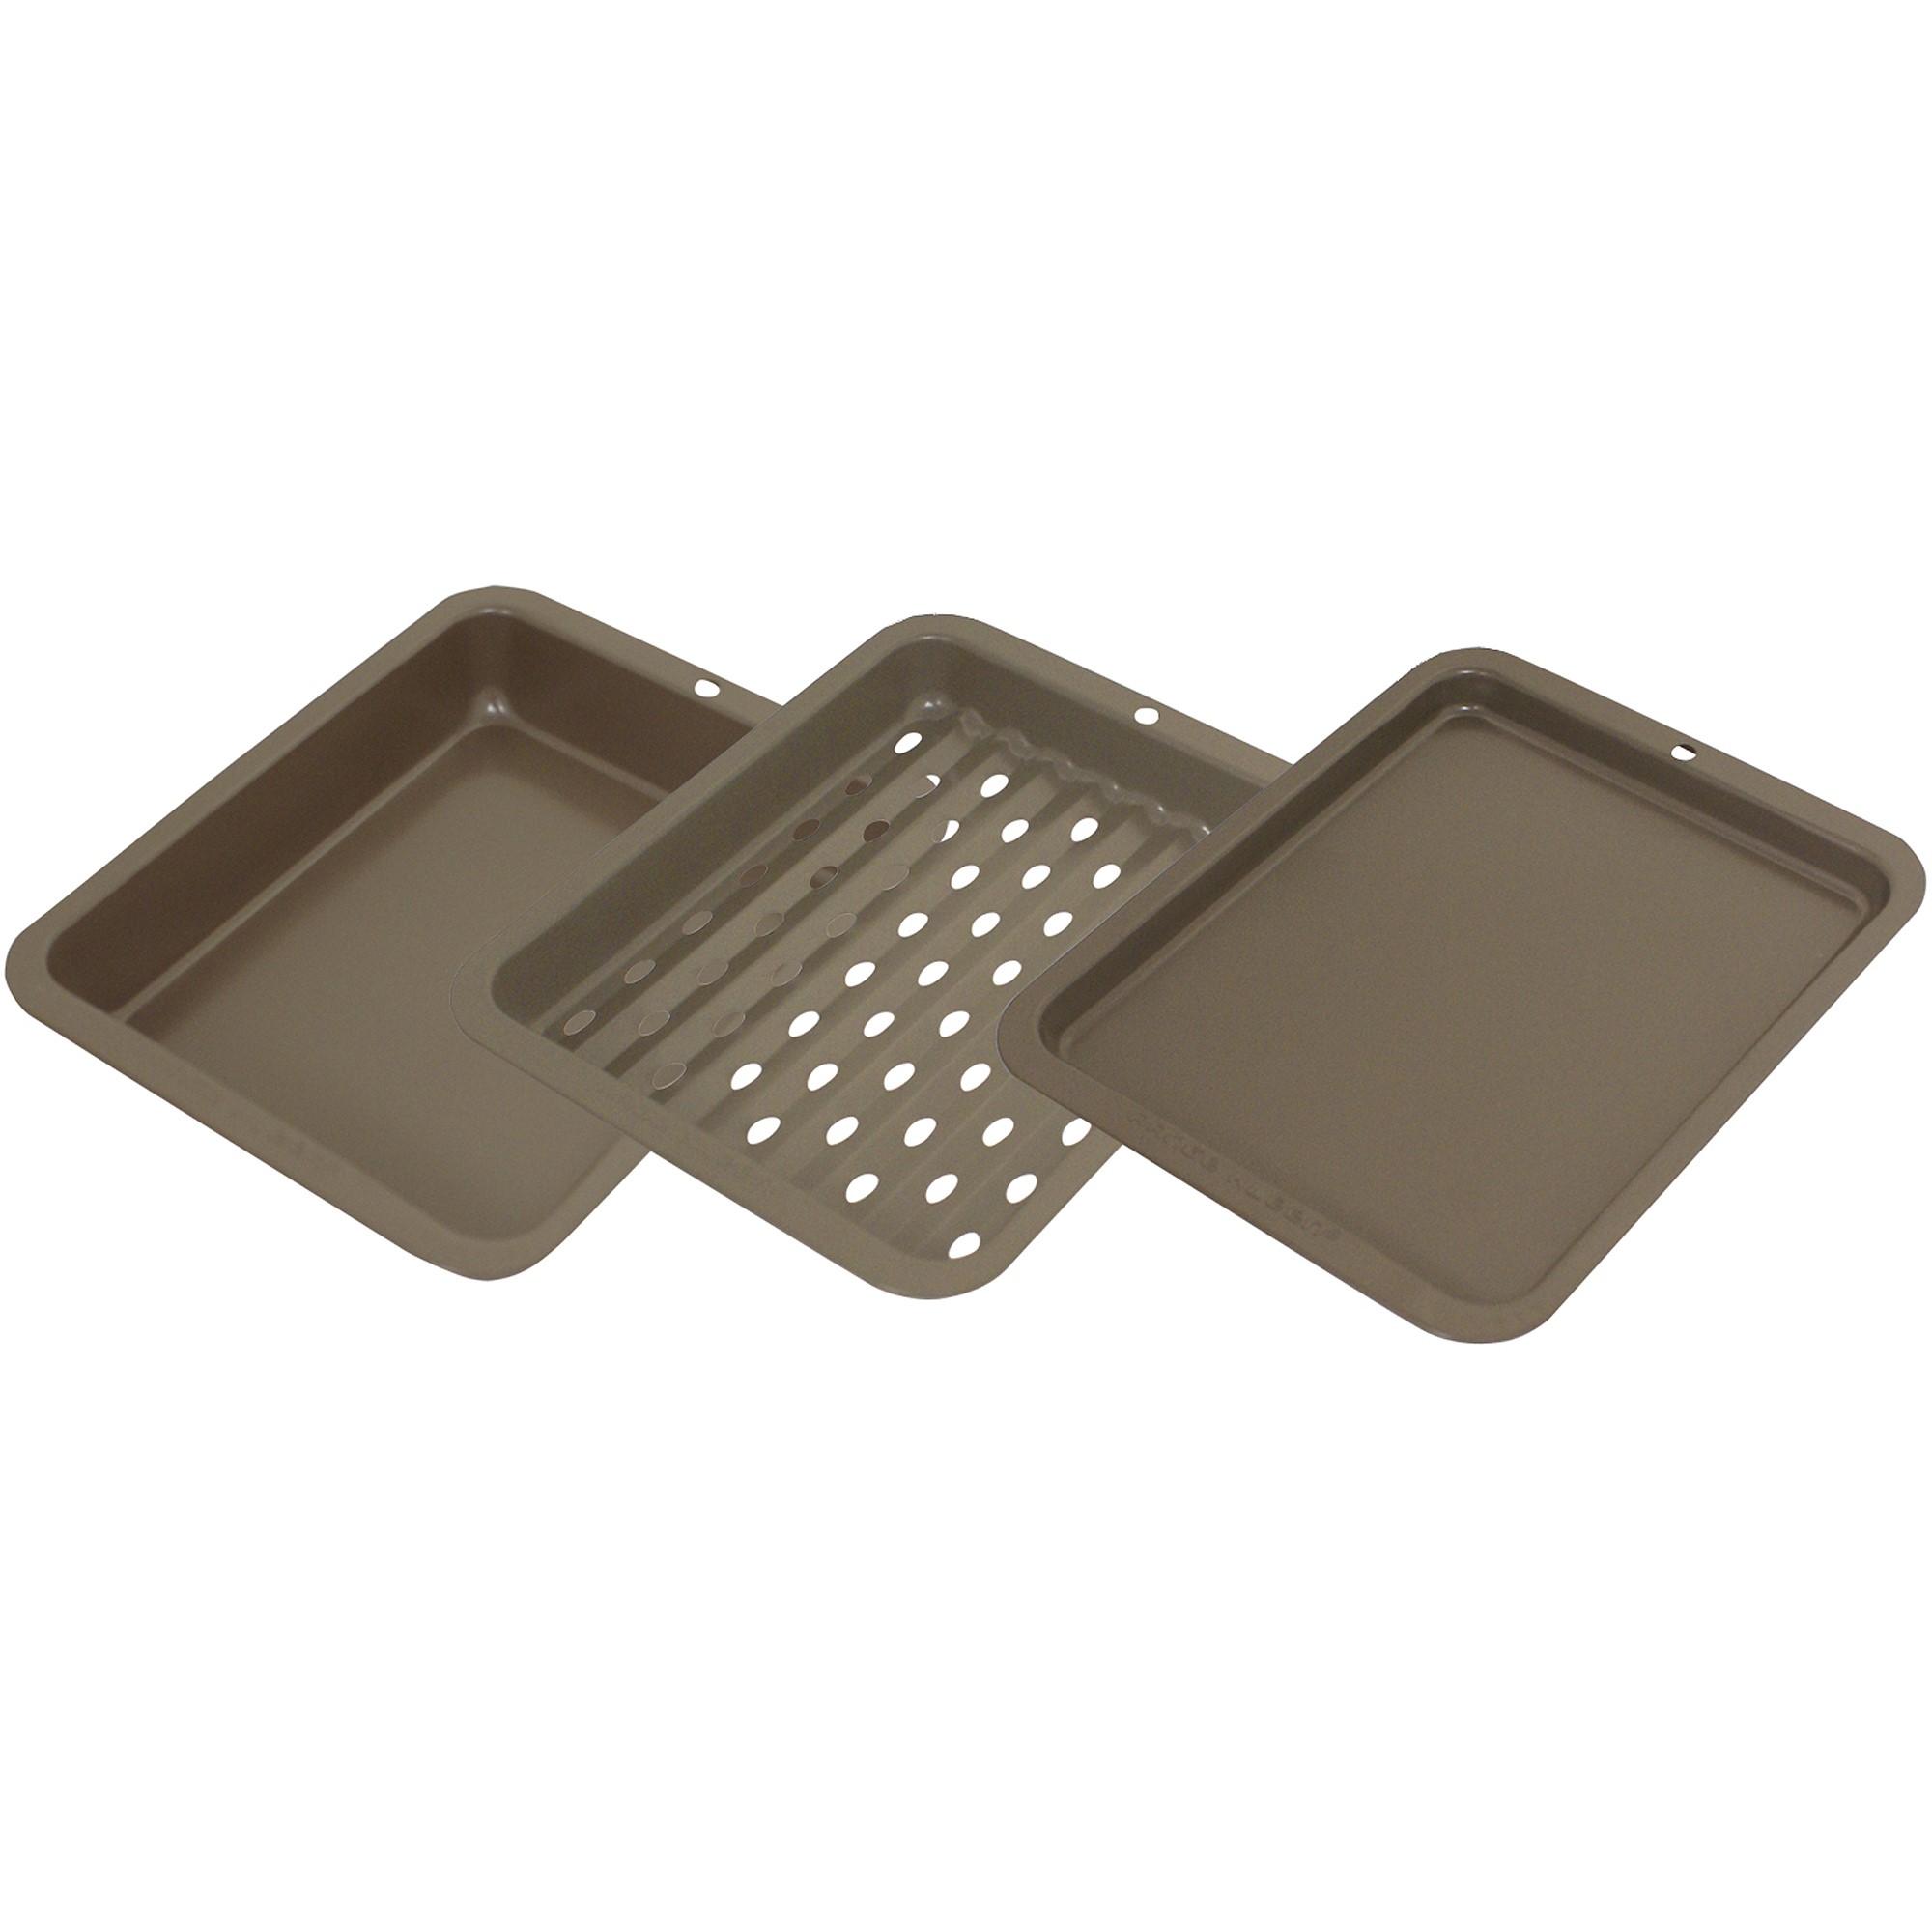 Range Kleen 3-Piece Non-Stick Toaster Oven Bakeware Set